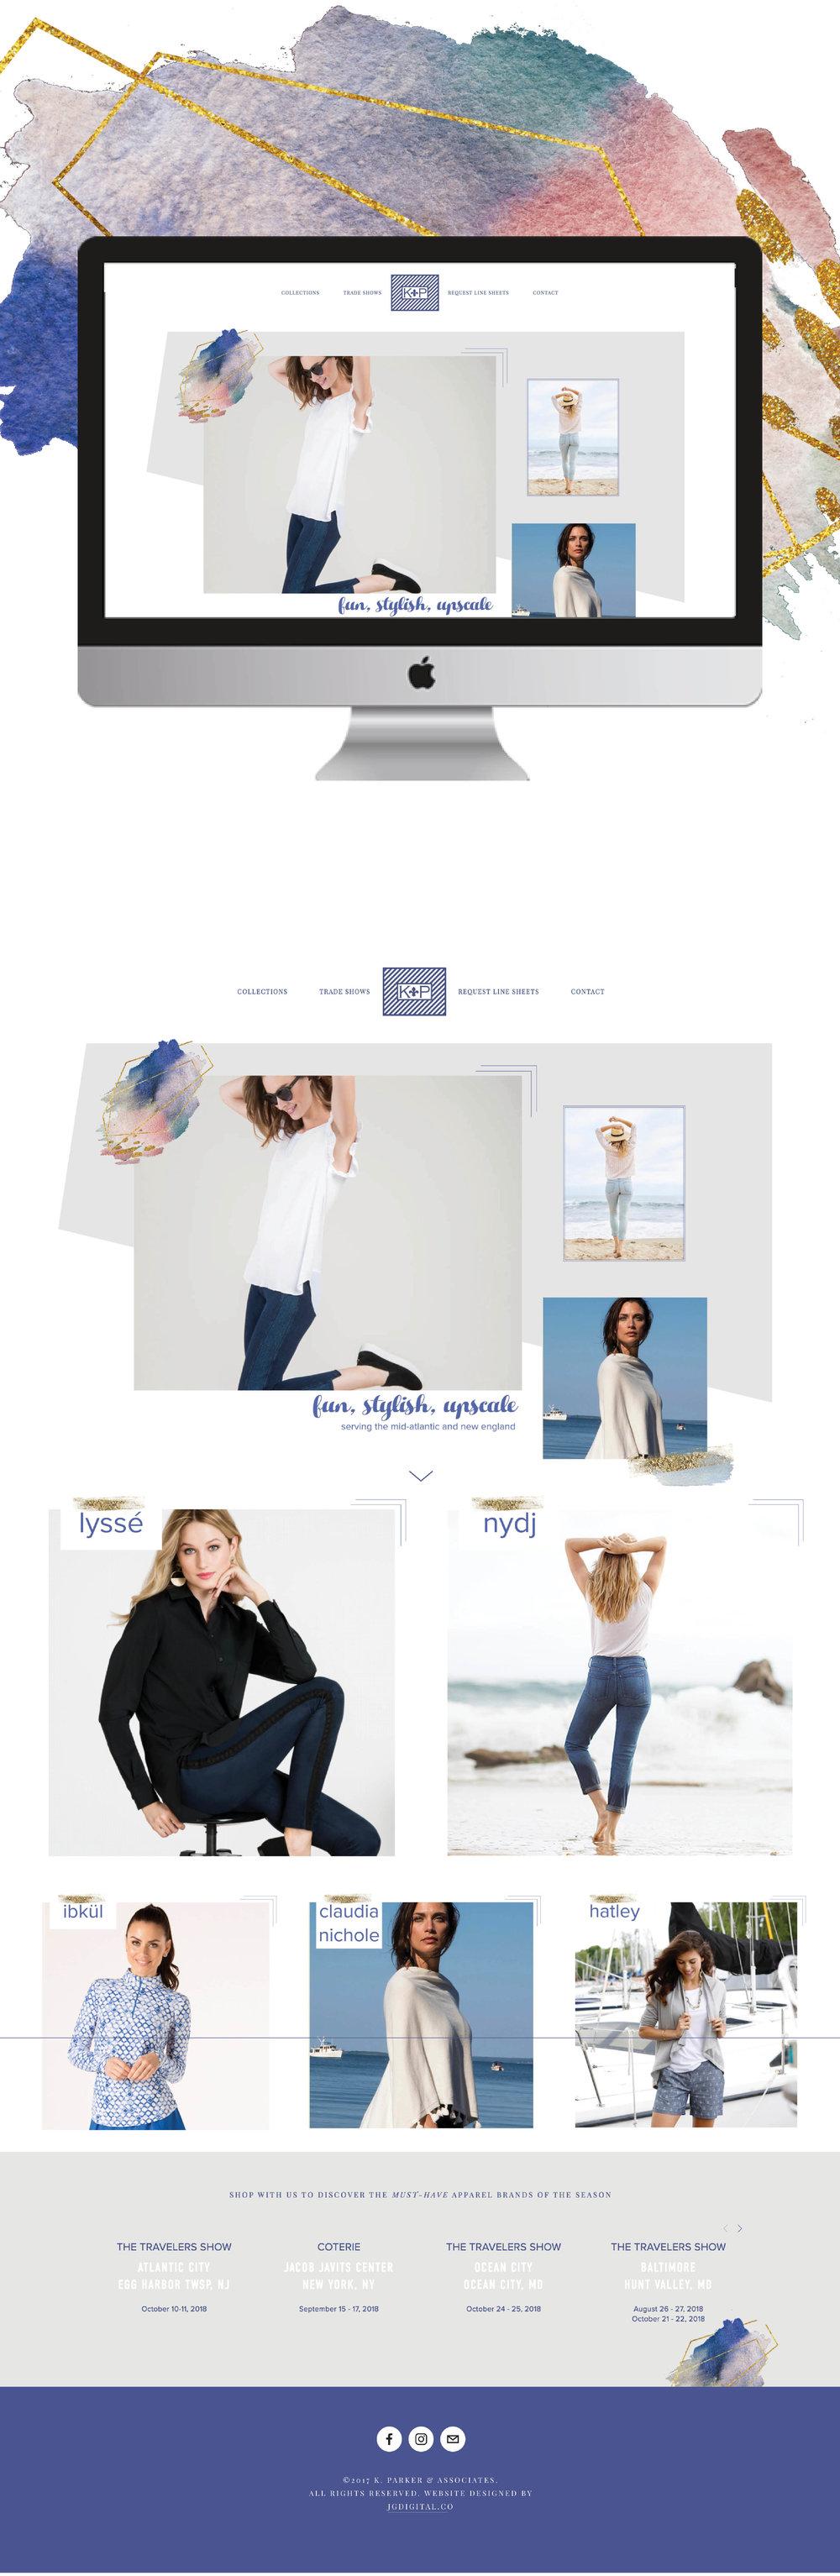 Fashion Apparel Website | Custom Squarespace Web Design for K. Parker & Associates by jgdigital.co